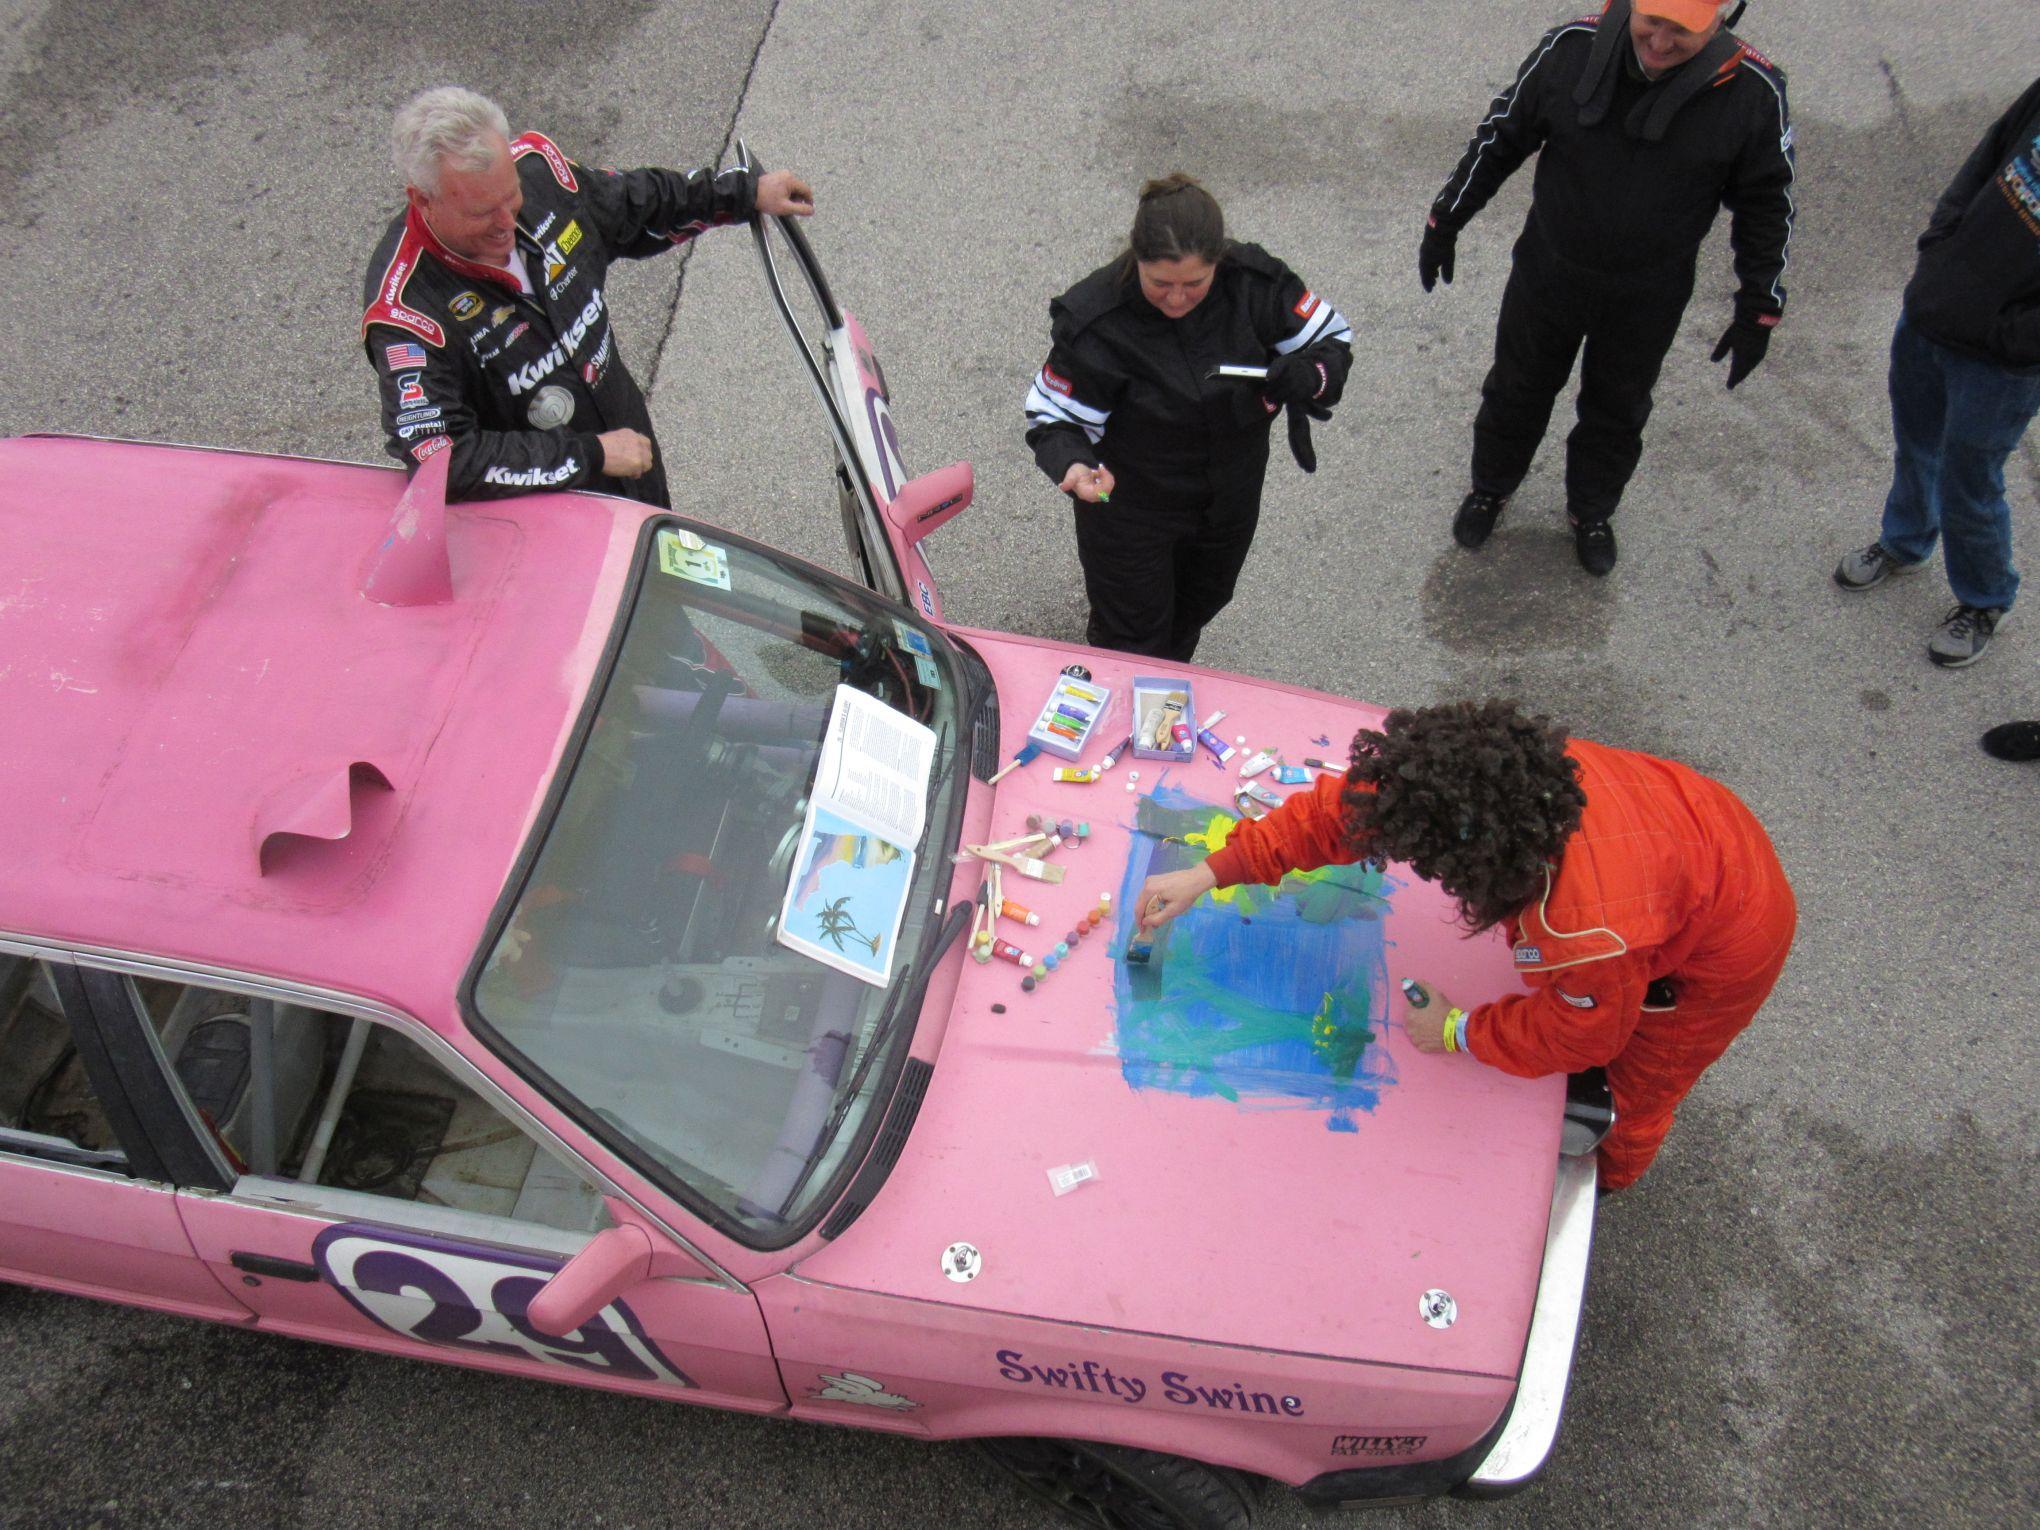 painting the swifty swine Lemons car